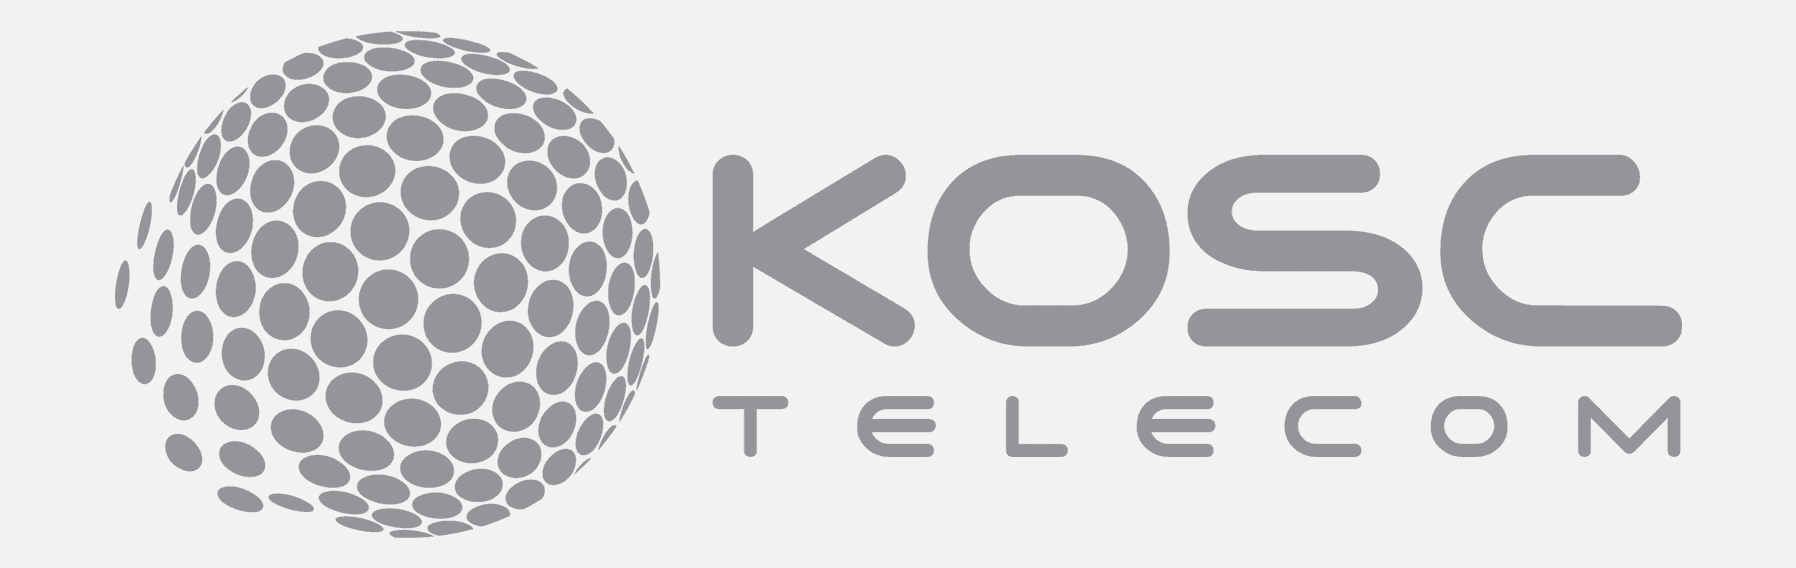 Kosc-telecom